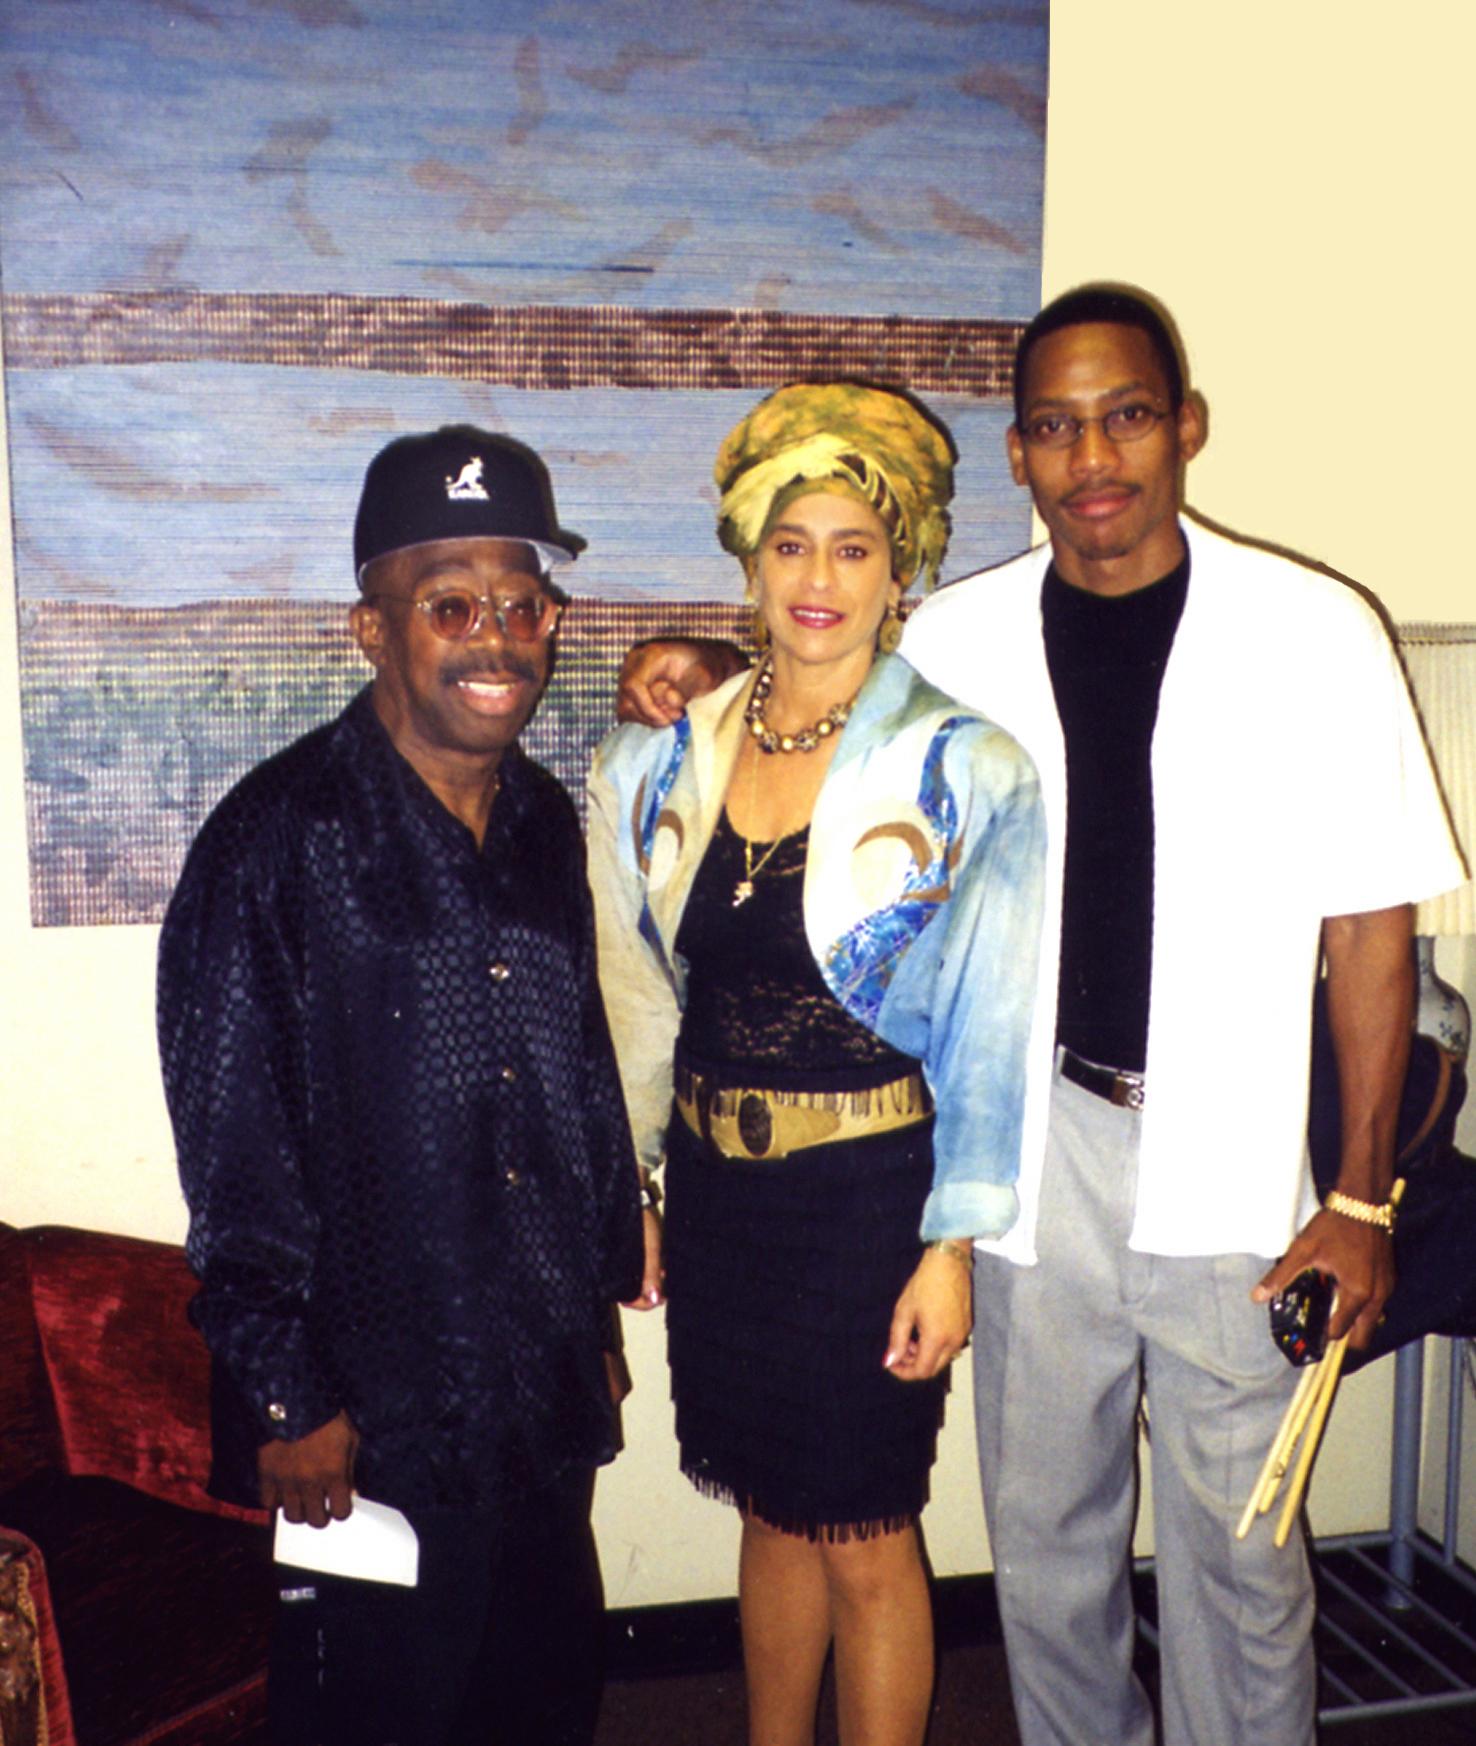 Michele Rosewoman with Master Orlando 'Puntilla' Rios and Pedrito Martinez